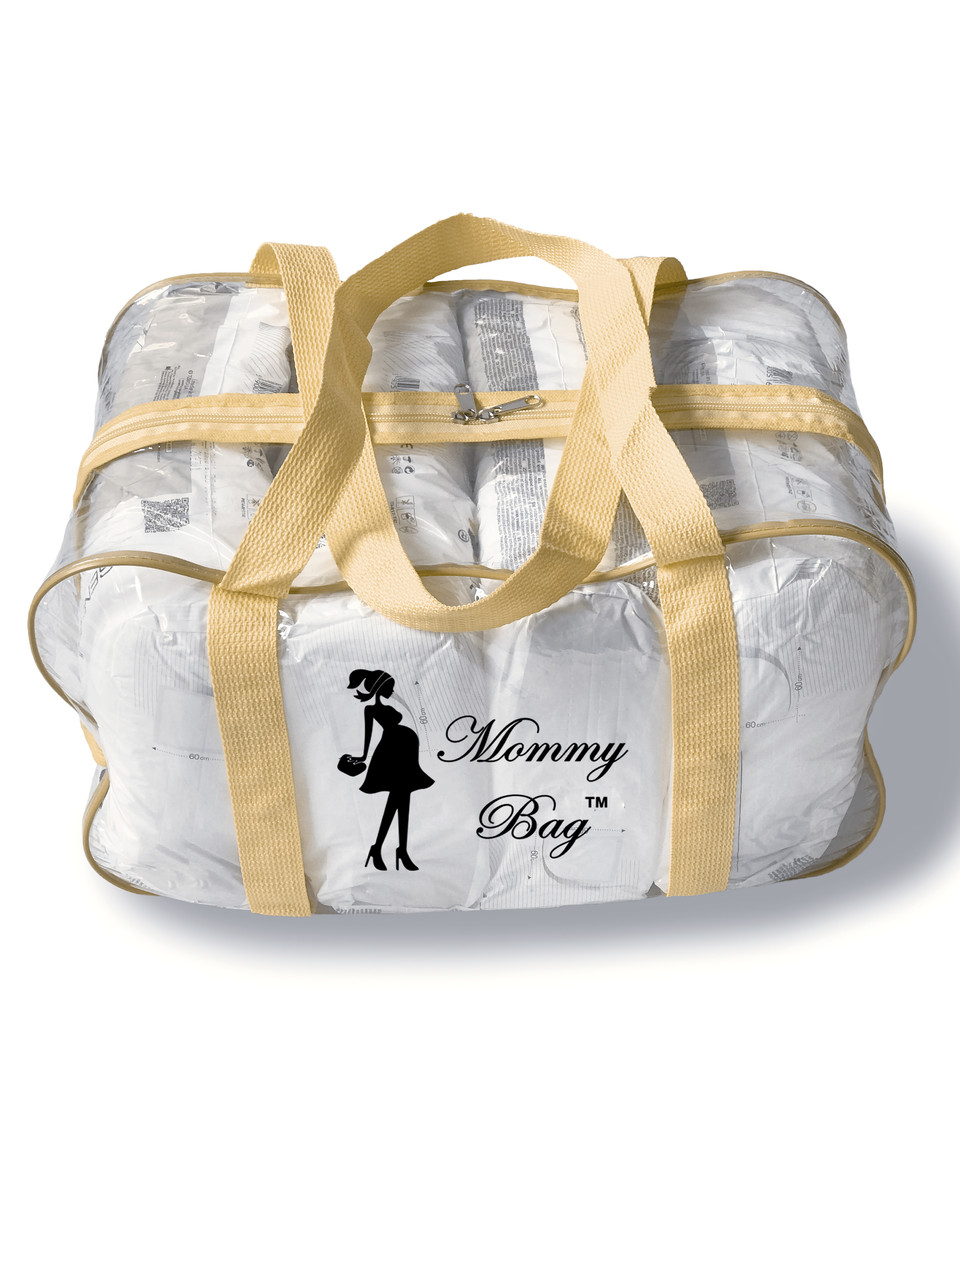 Сумка прозрачная в роддом Mommy Bag - M - 40*25*20 см Бежевая